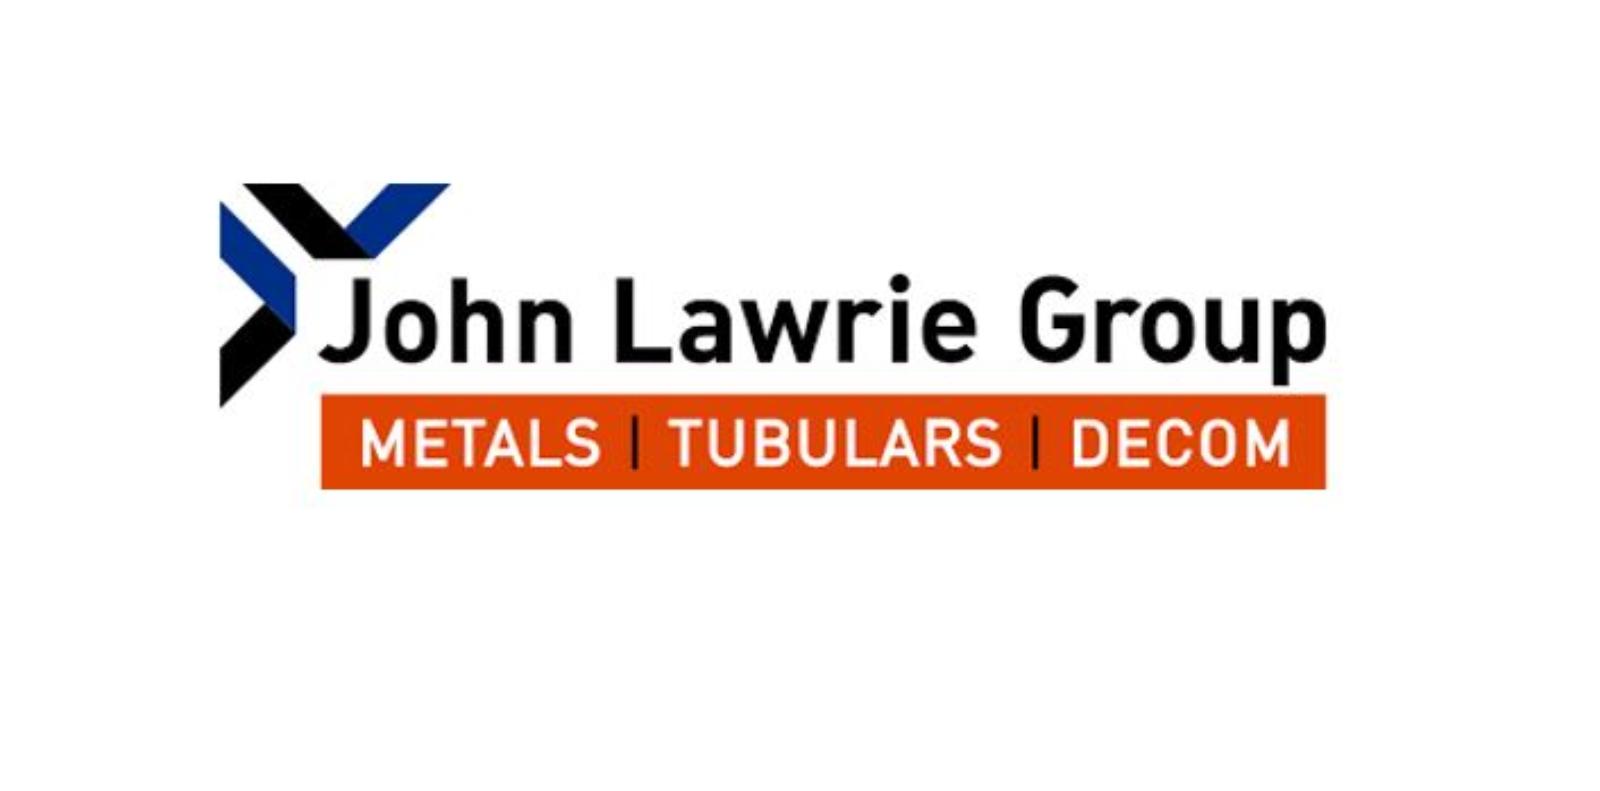 John Lawrie Group: maximise reuse and minimise disposal